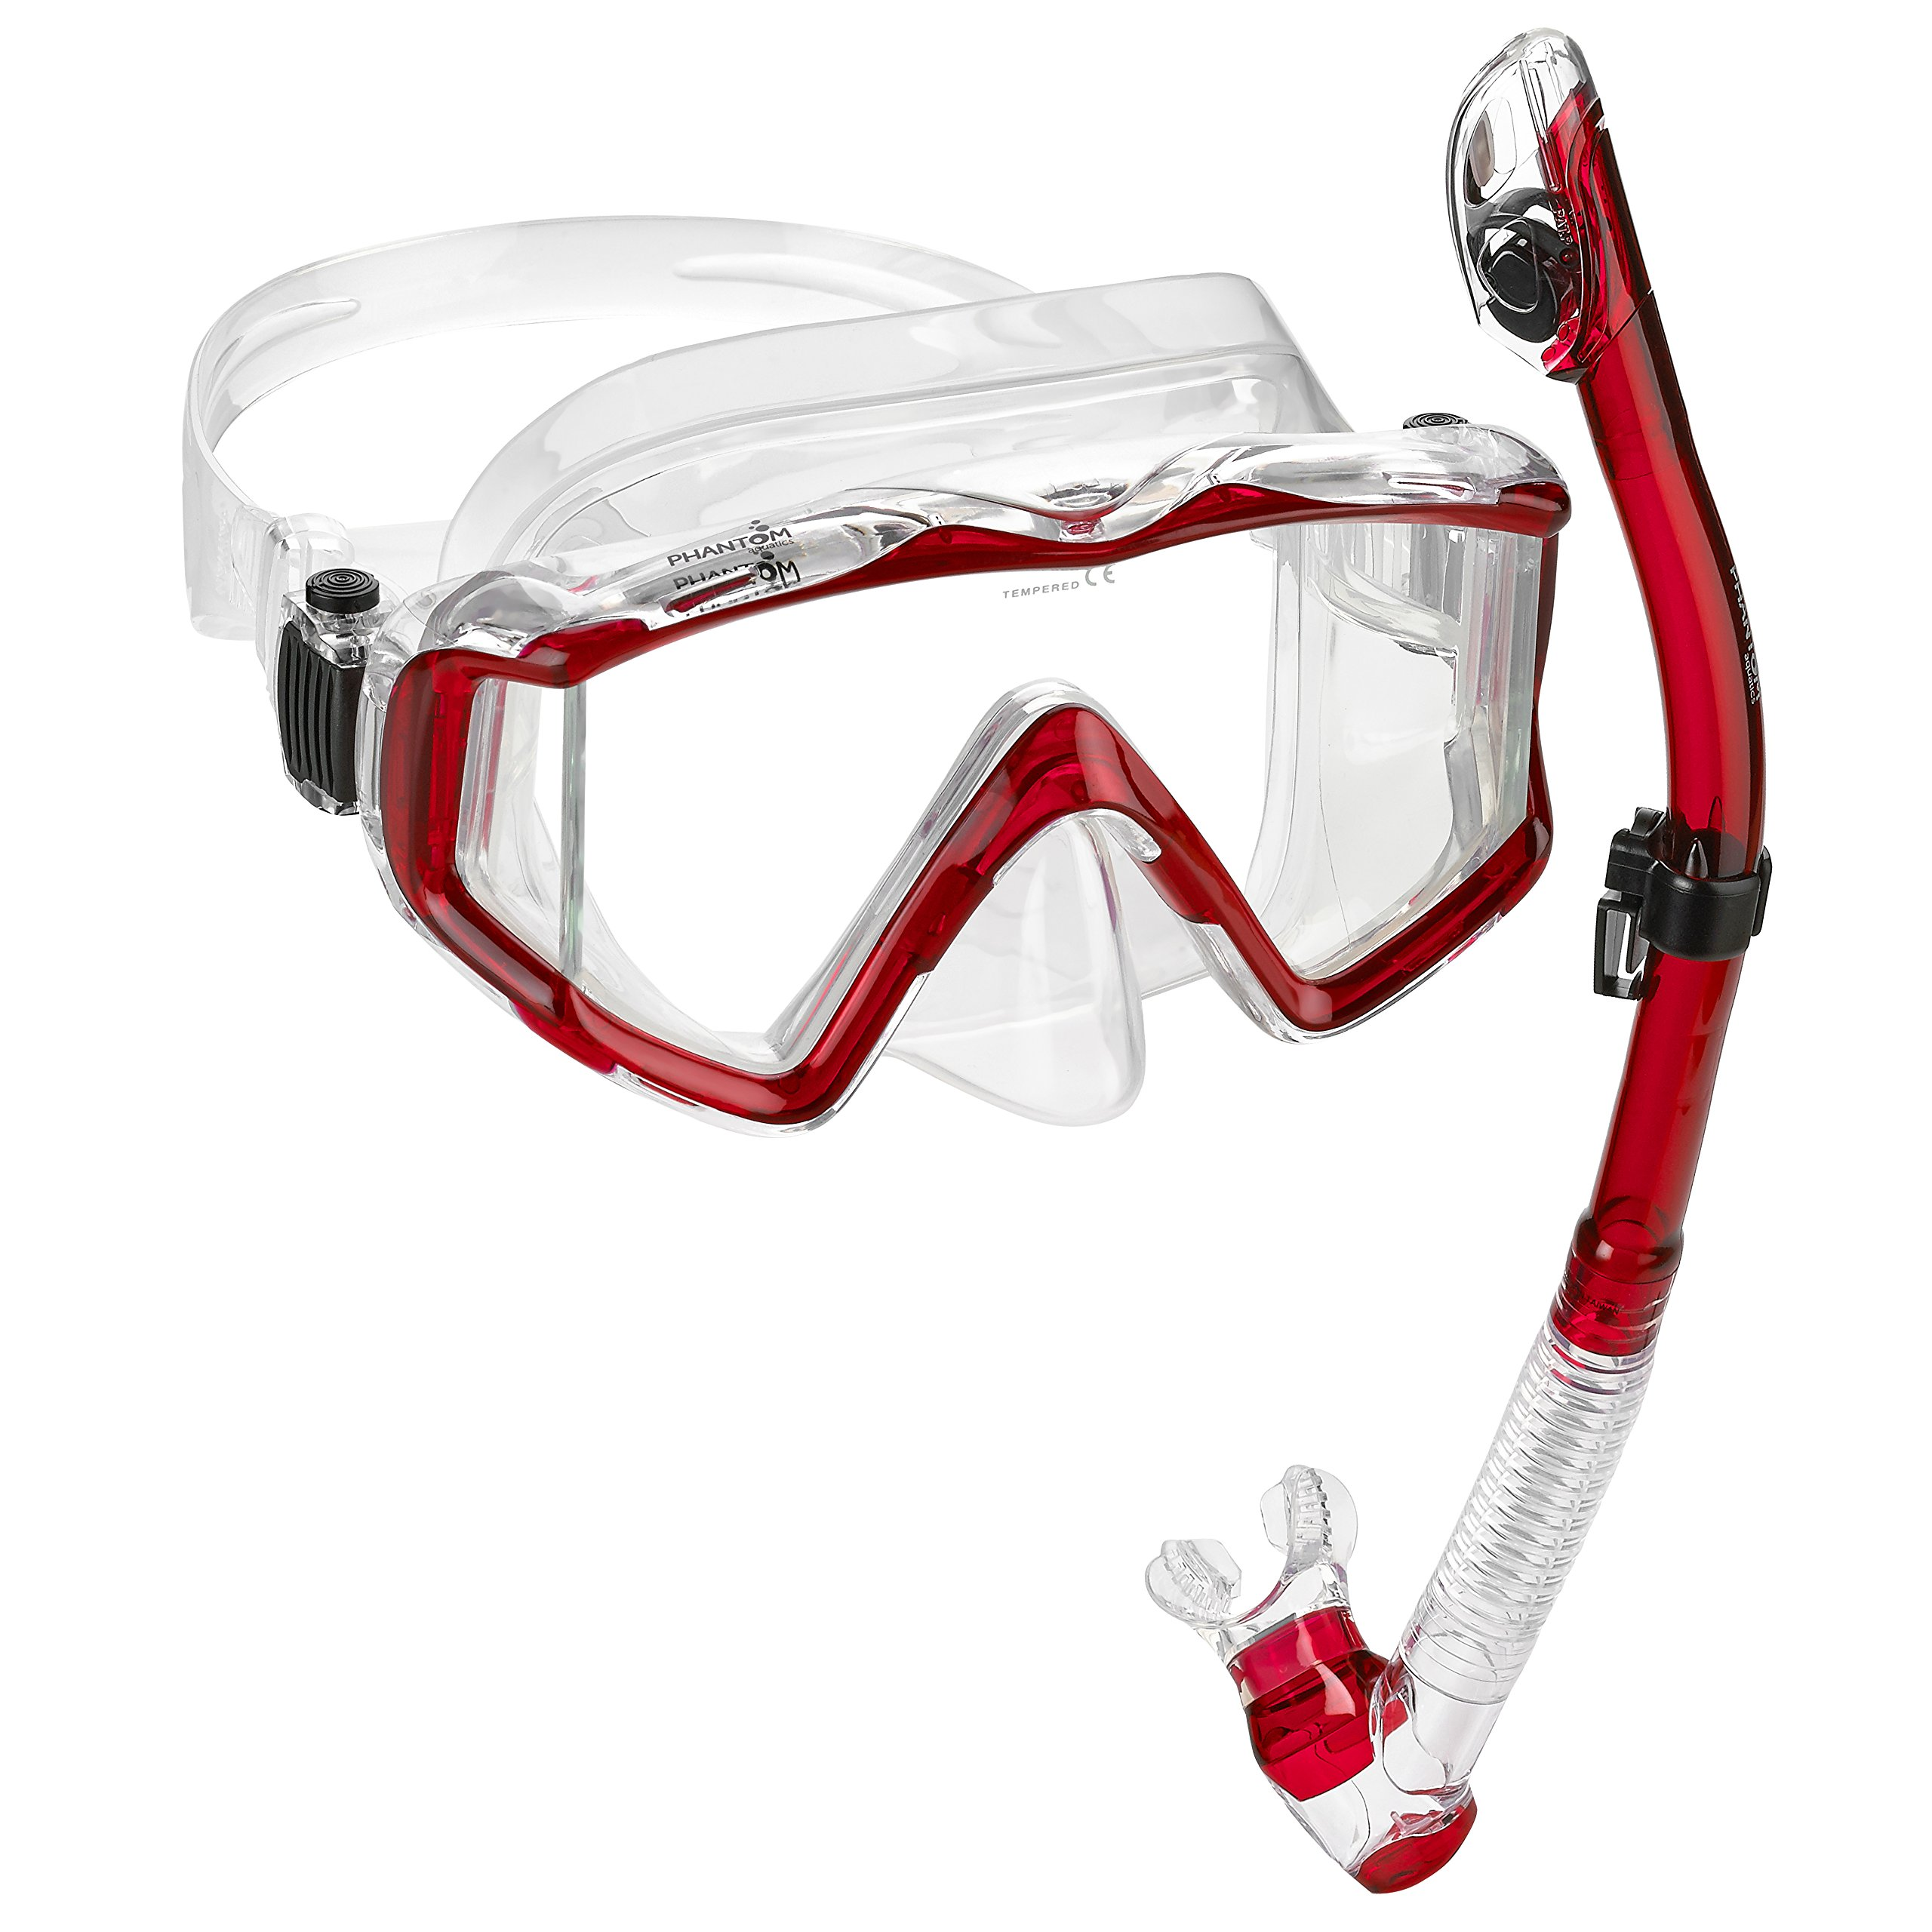 Phantom Aquatics Ultra Panoramic View Scuba Snorkeling Mask Dry Snorkel Set (Red) by Phantom Aquatics